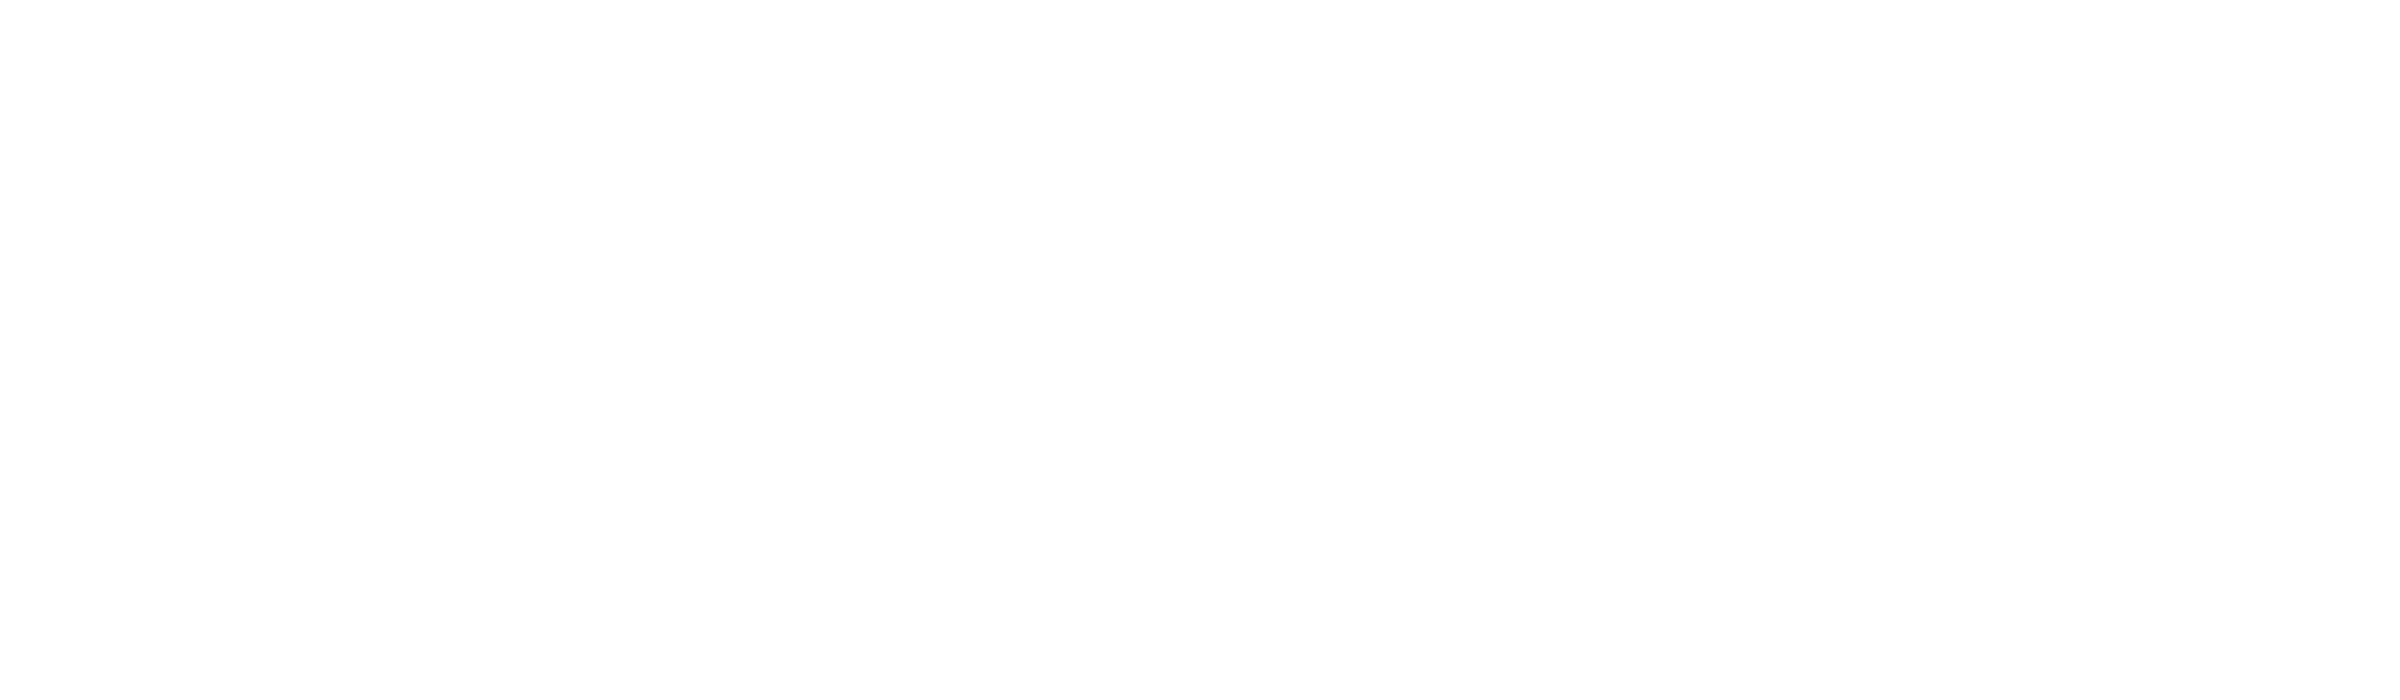 0102_LOGO_jeremy-frechette_horizontal_light.png